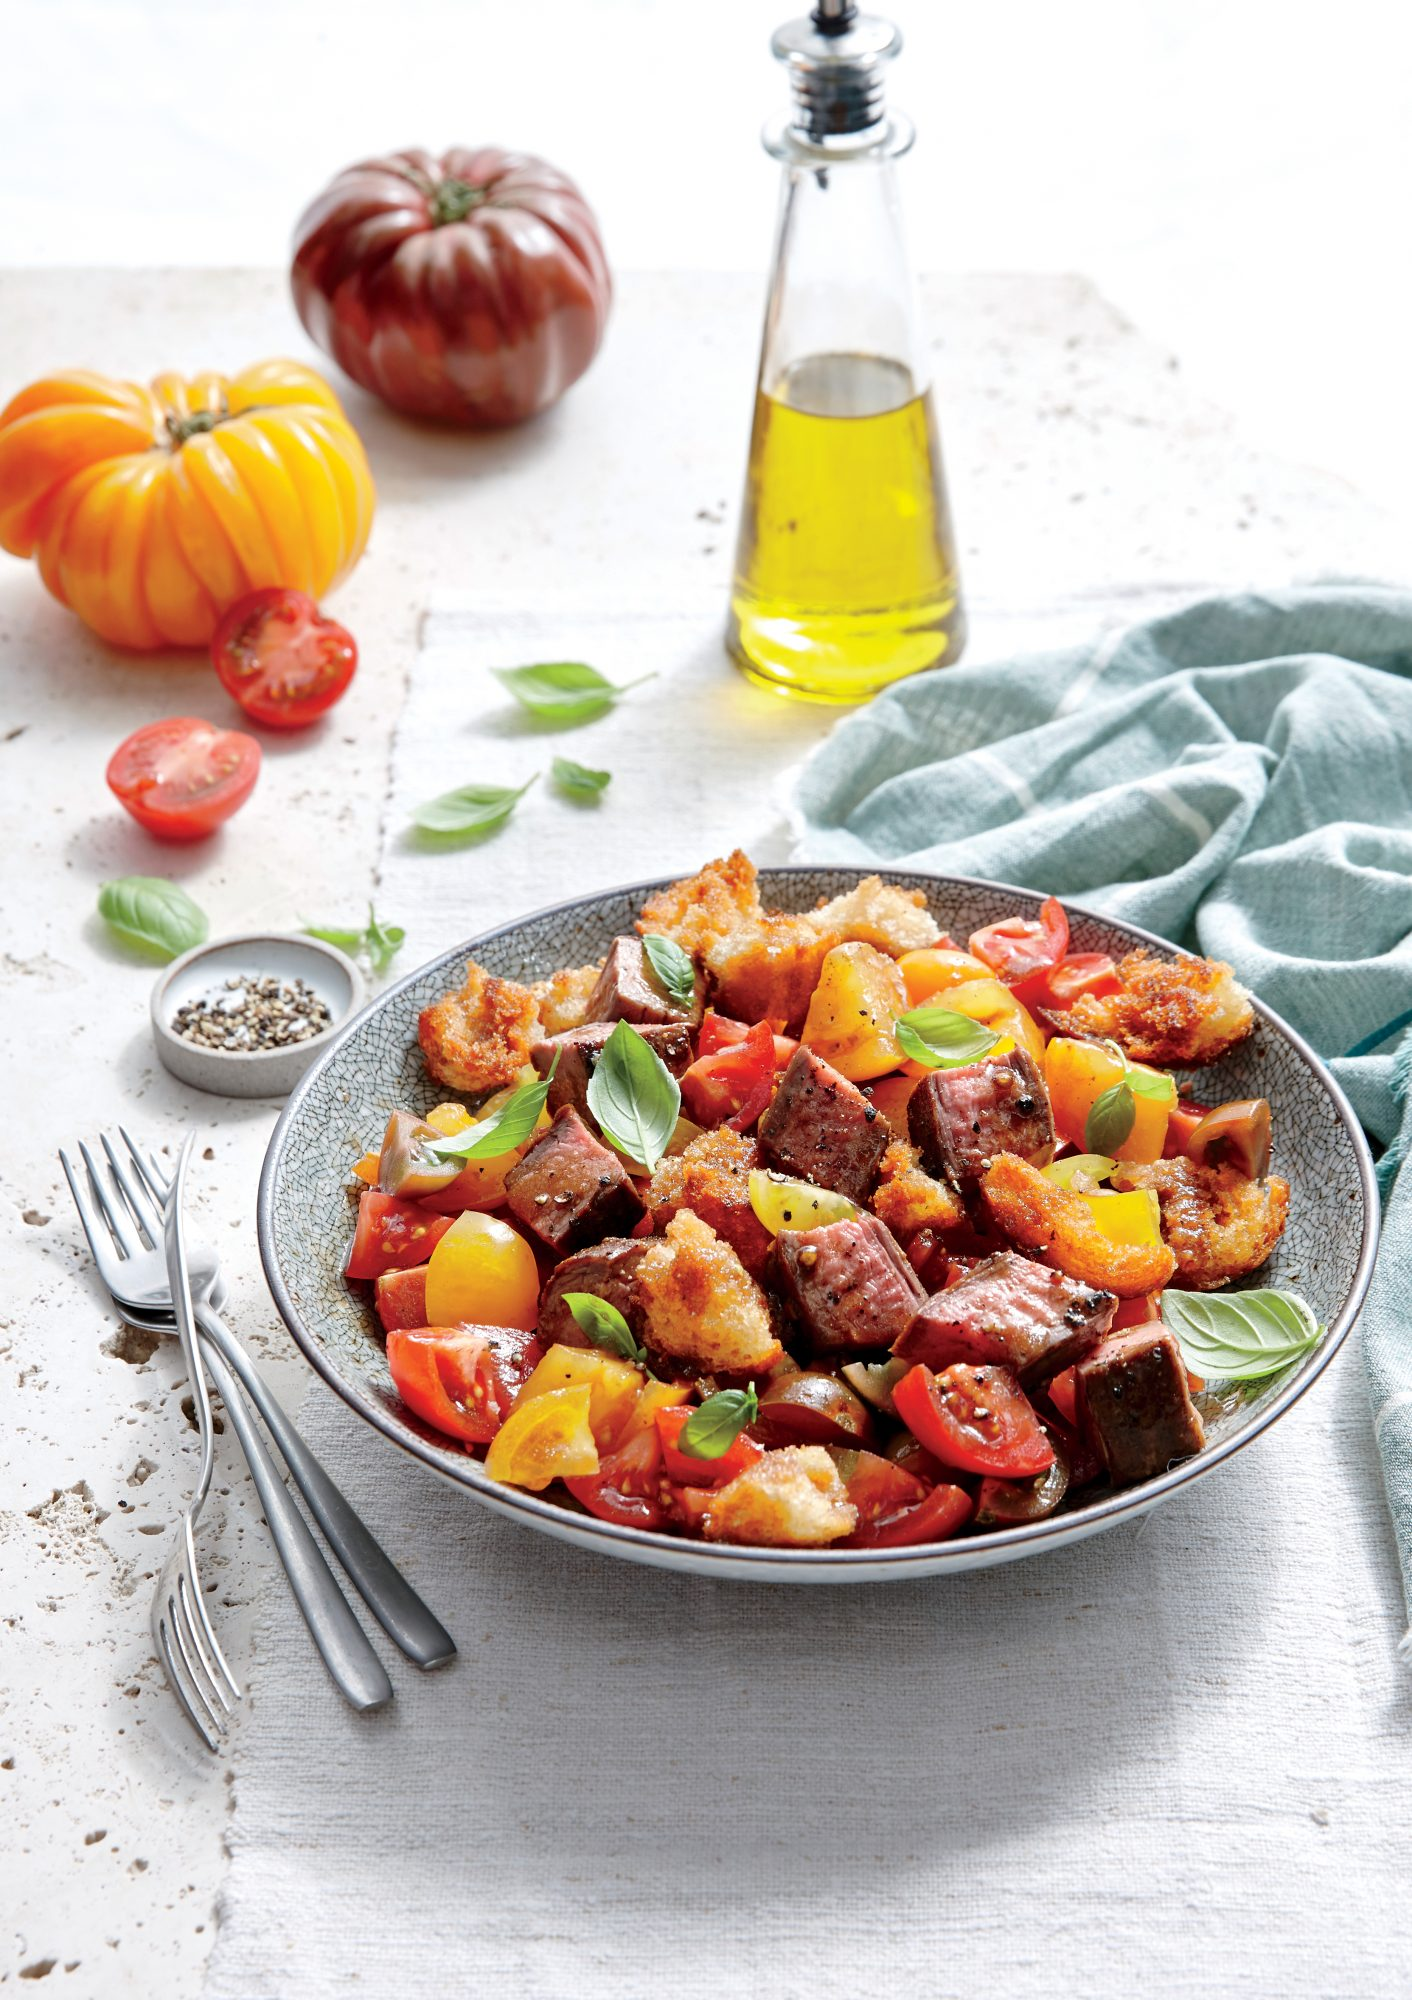 Steak and Tomato Panzanella